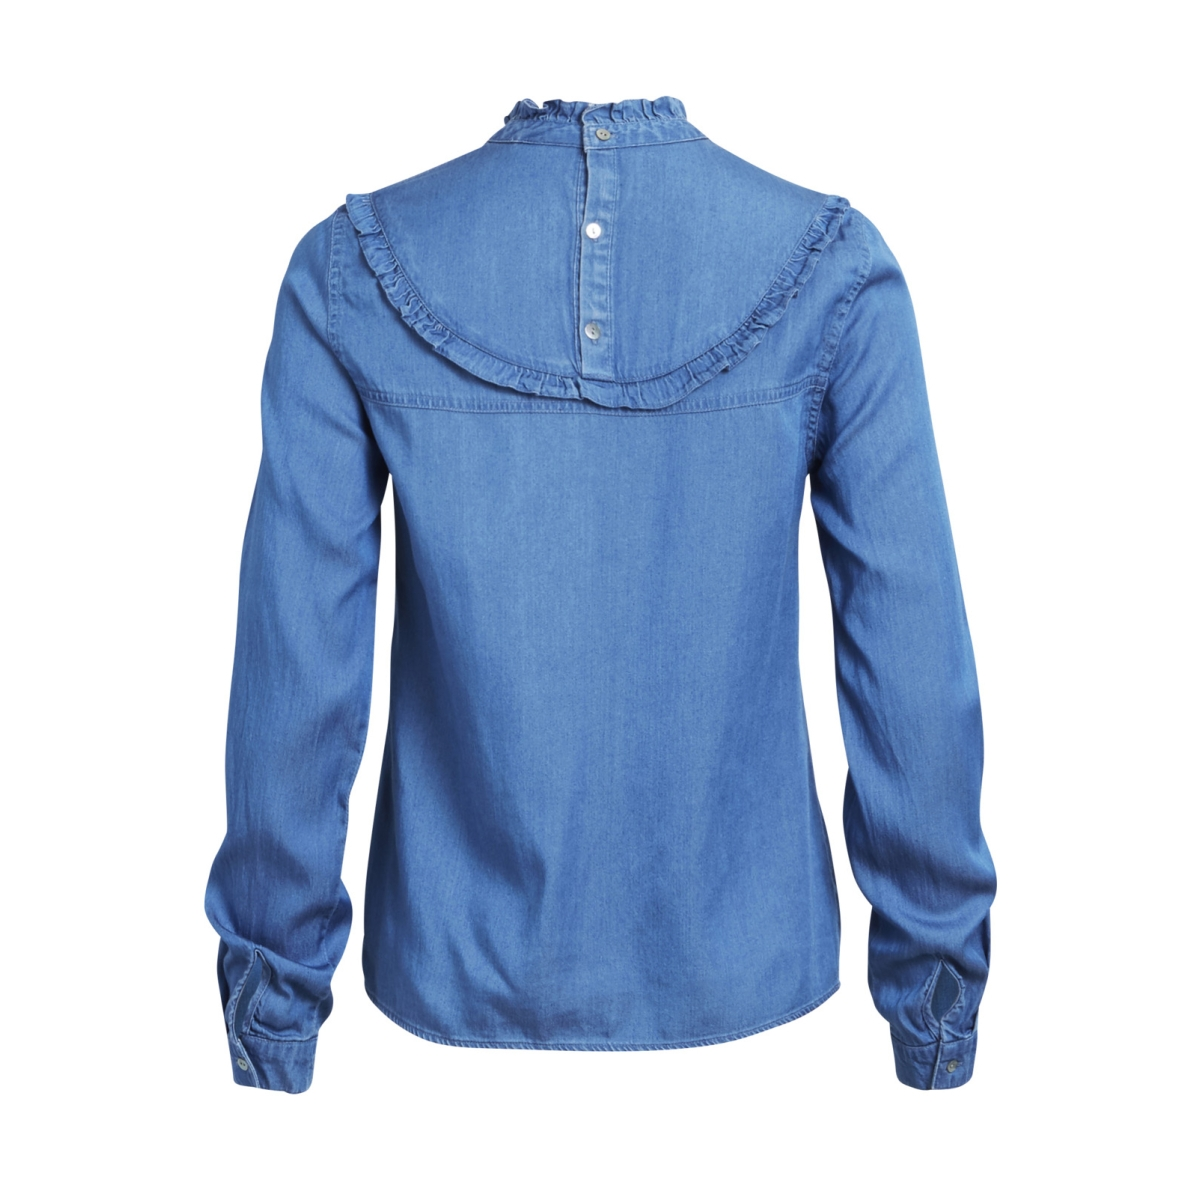 vibista l/s denim ruffle top 14043748 vila blouse medium blue denim